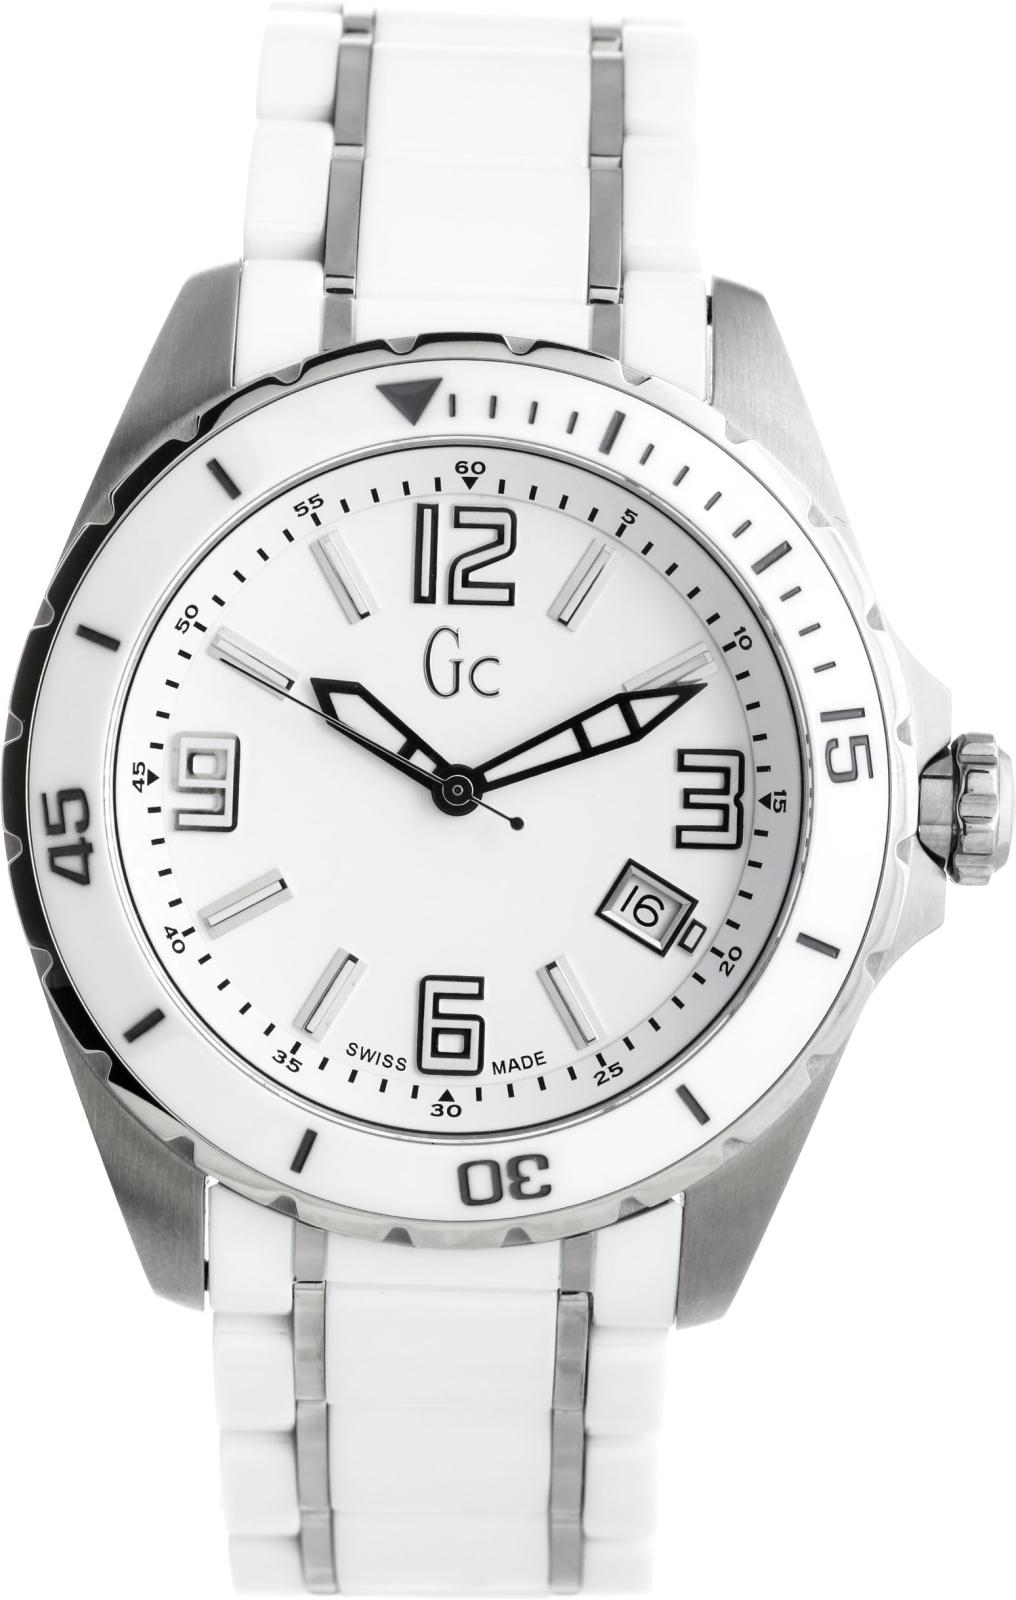 GC Sport Chic X85009G1SНаручные часы<br>Швейцарские часы GC Sport Chic X85009G1S<br><br>Пол: Мужские<br>Страна-производитель: Швейцария<br>Механизм: Кварцевый<br>Материал корпуса: Сталь+керамика<br>Материал ремня/браслета: Сталь+керамика<br>Водозащита, диапазон: 100 - 150 м<br>Стекло: Сапфировое<br>Толщина корпуса: None<br>Стиль: Классика